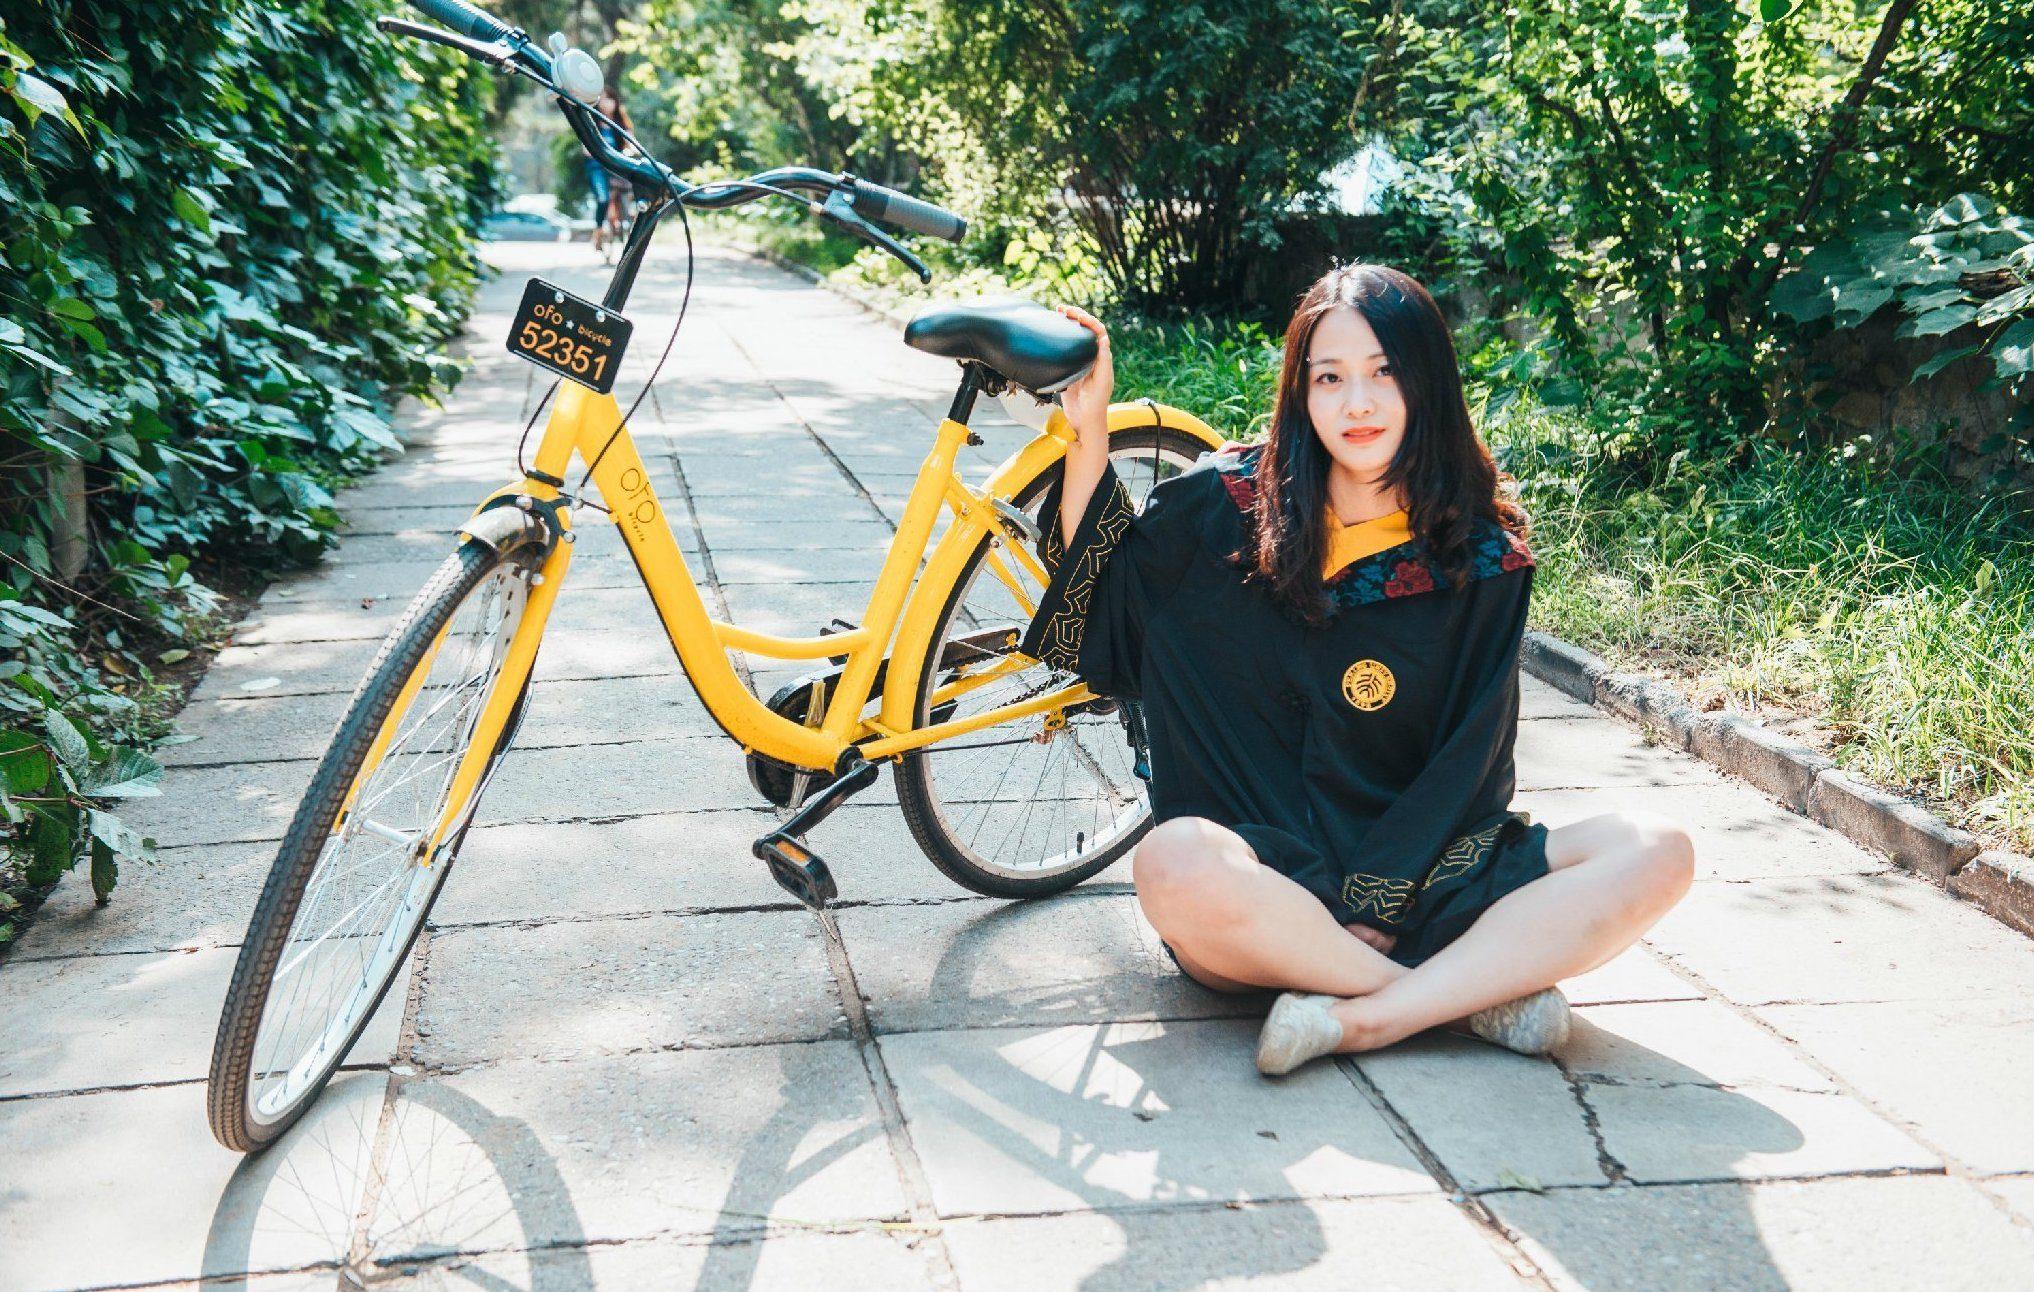 Fuente: https://cdn.techinasia.com/wp-content/uploads/2016/09/Didi-funds-OFO-to-make-bike-sharing-a-thing.jpg